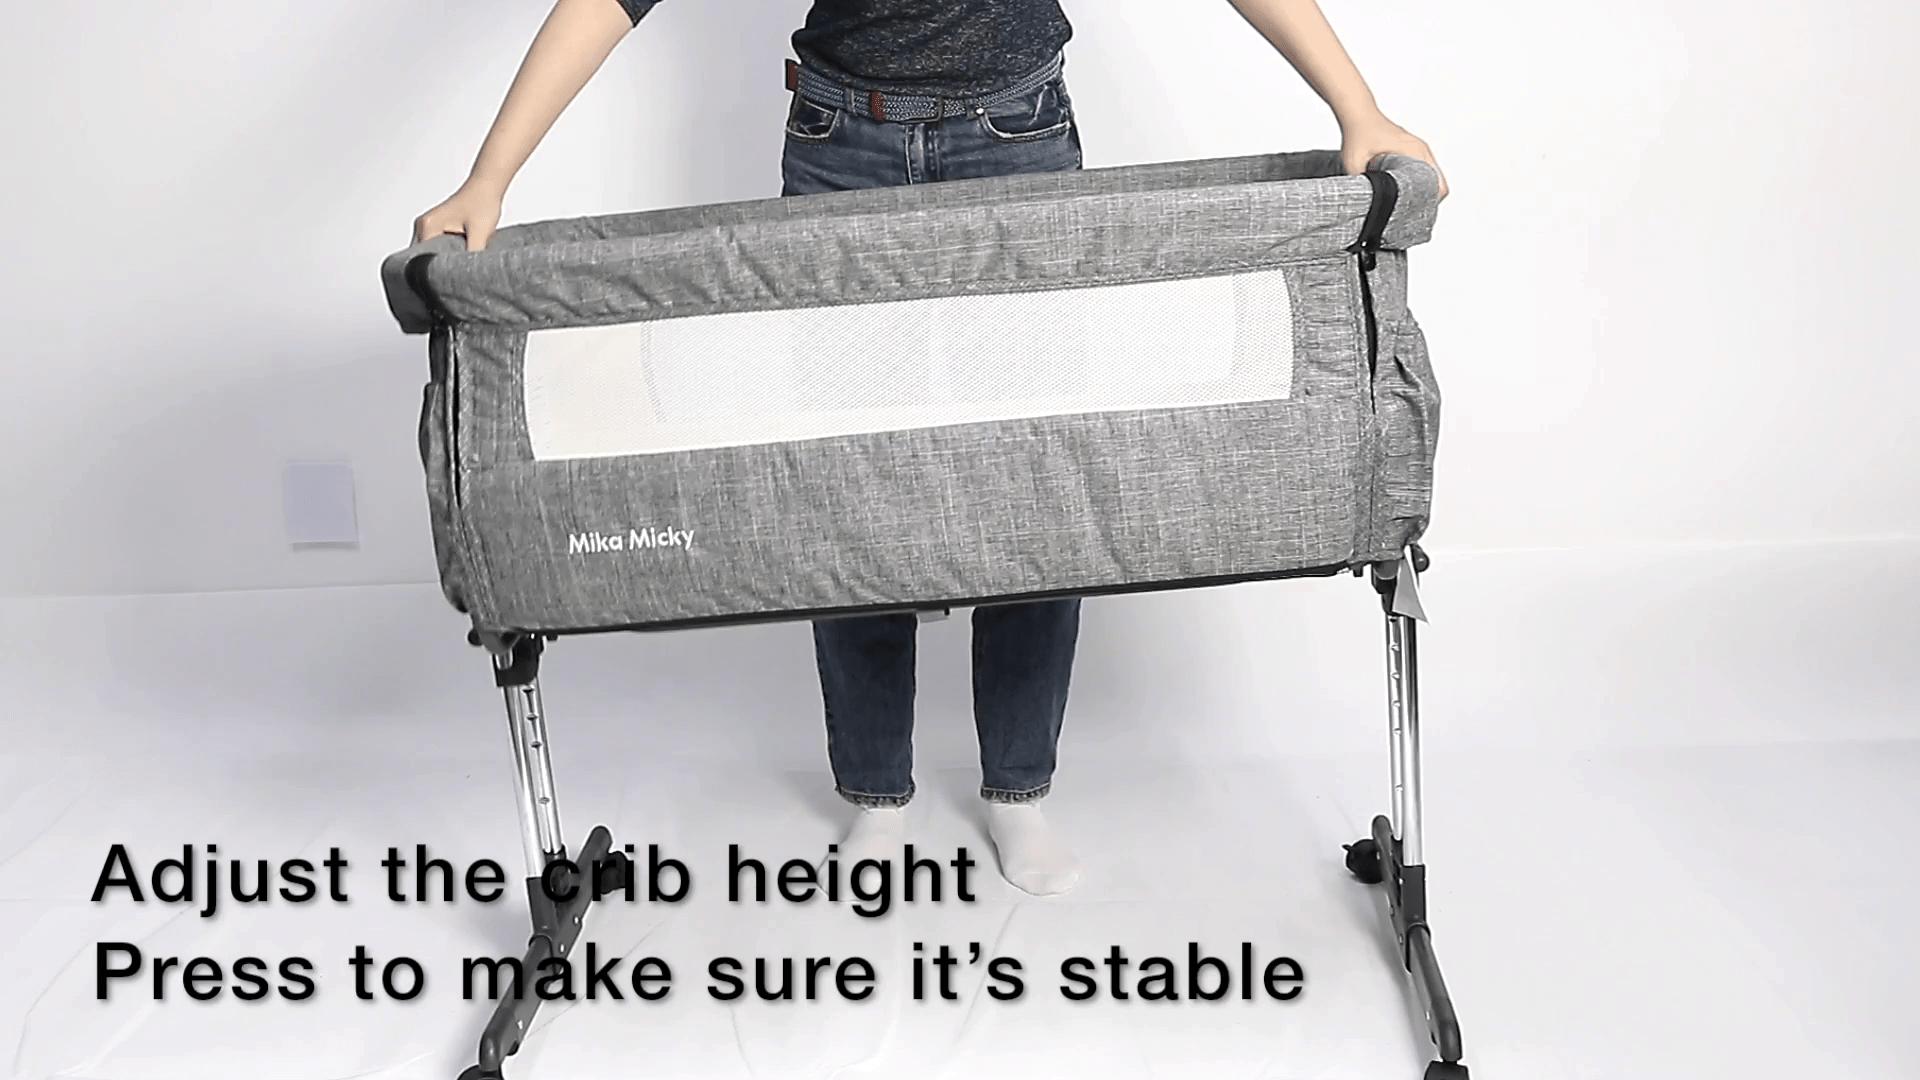 Mika Micky - adjust the height 3